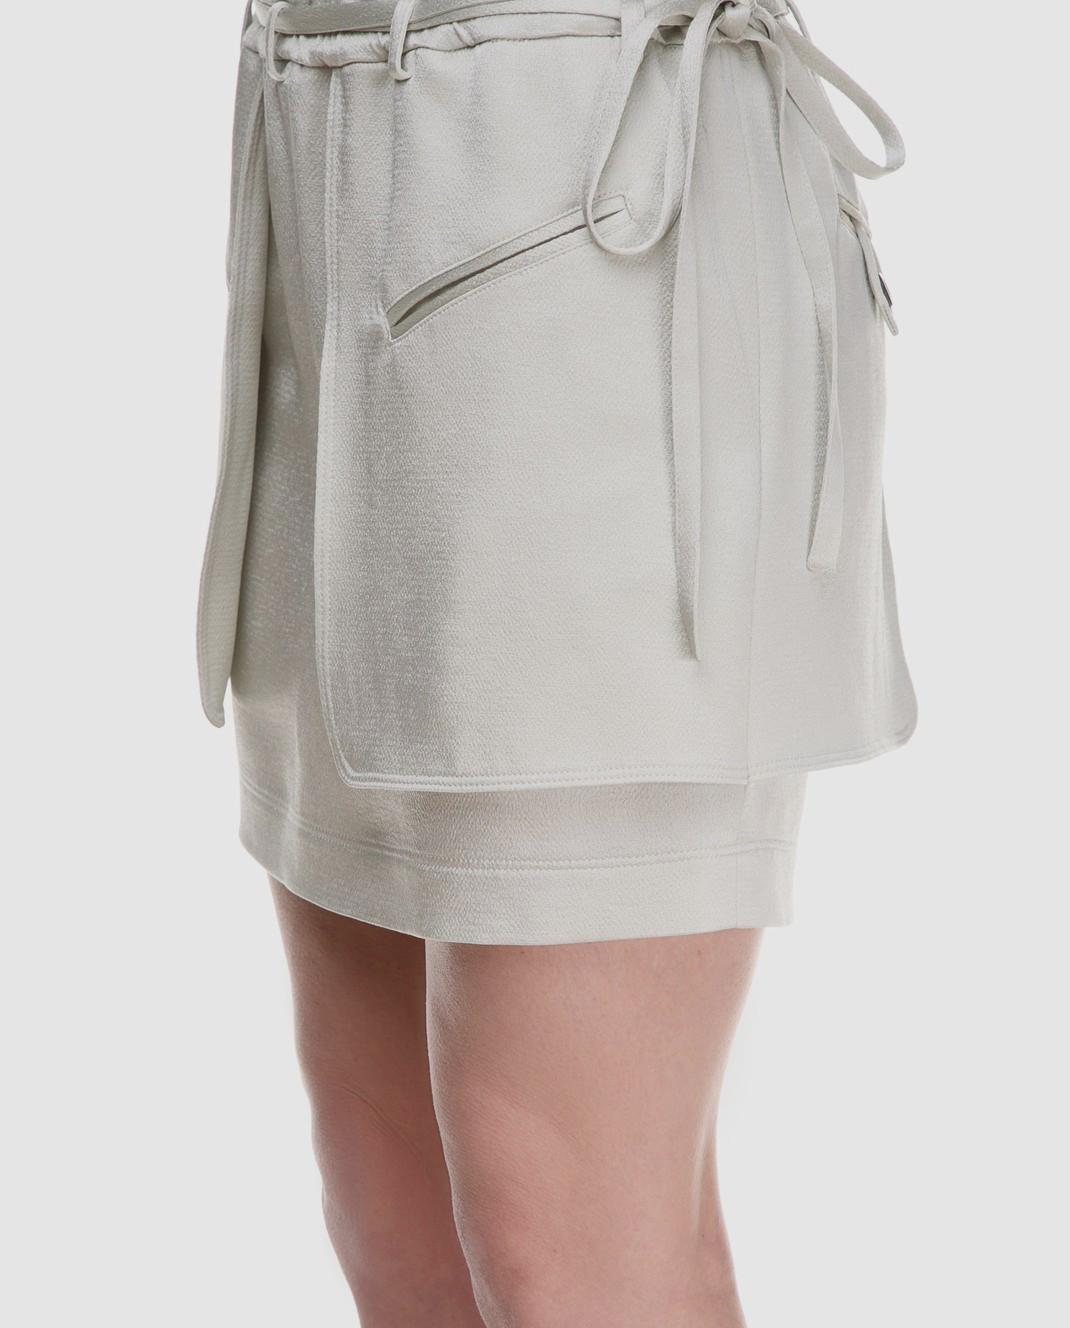 Valentino Светло-зеленая юбка PB0RA3K53H3 изображение 3